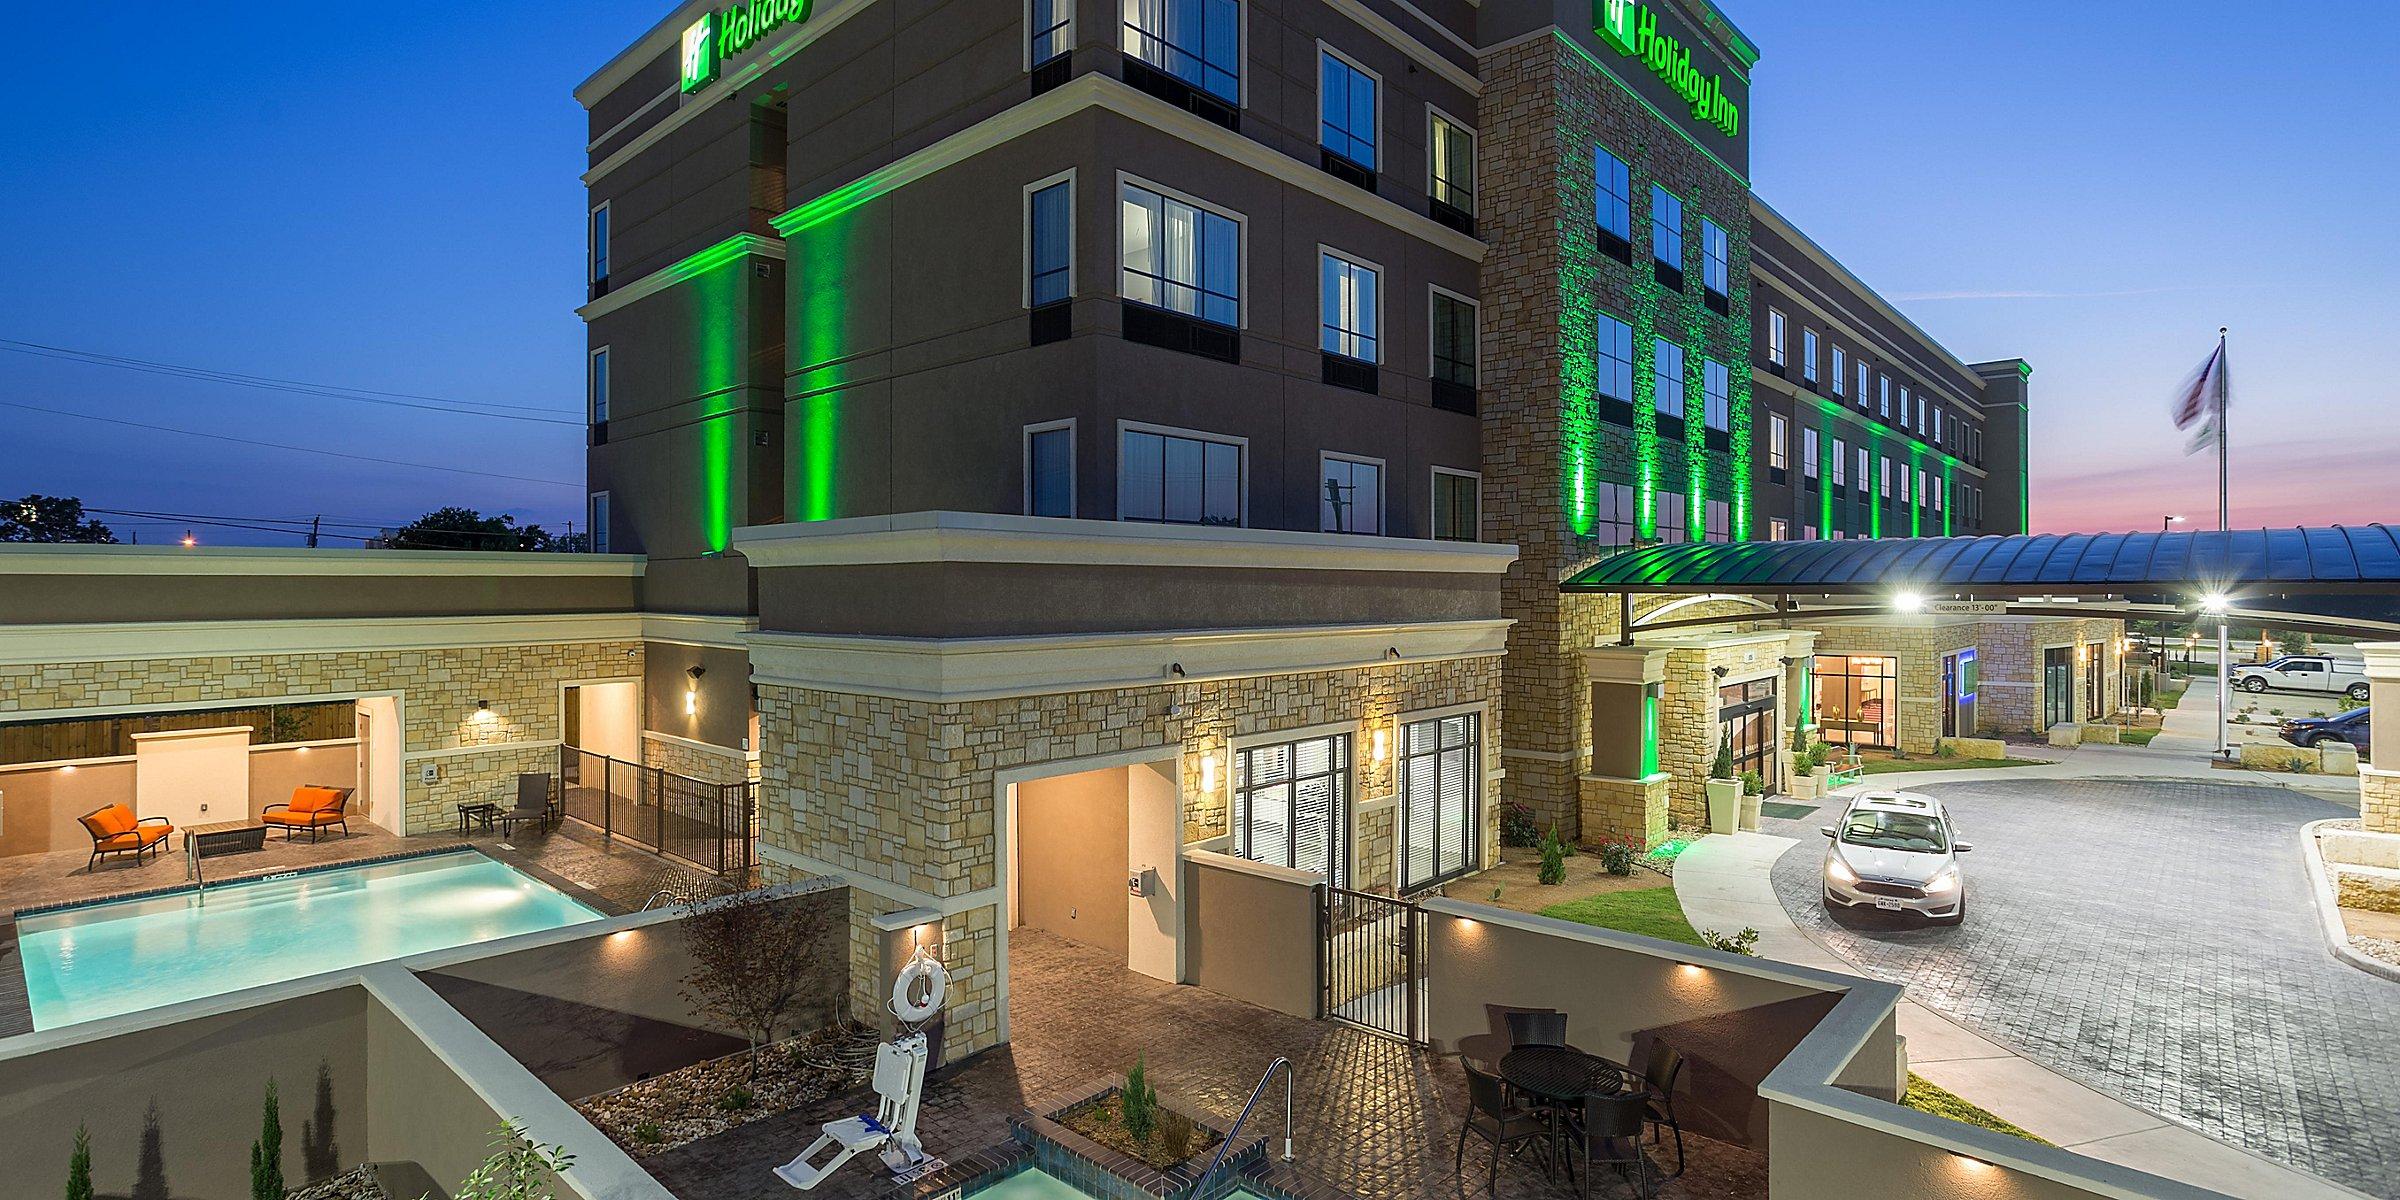 Holiday Inn, newest full service hotel in San Marcos, TX